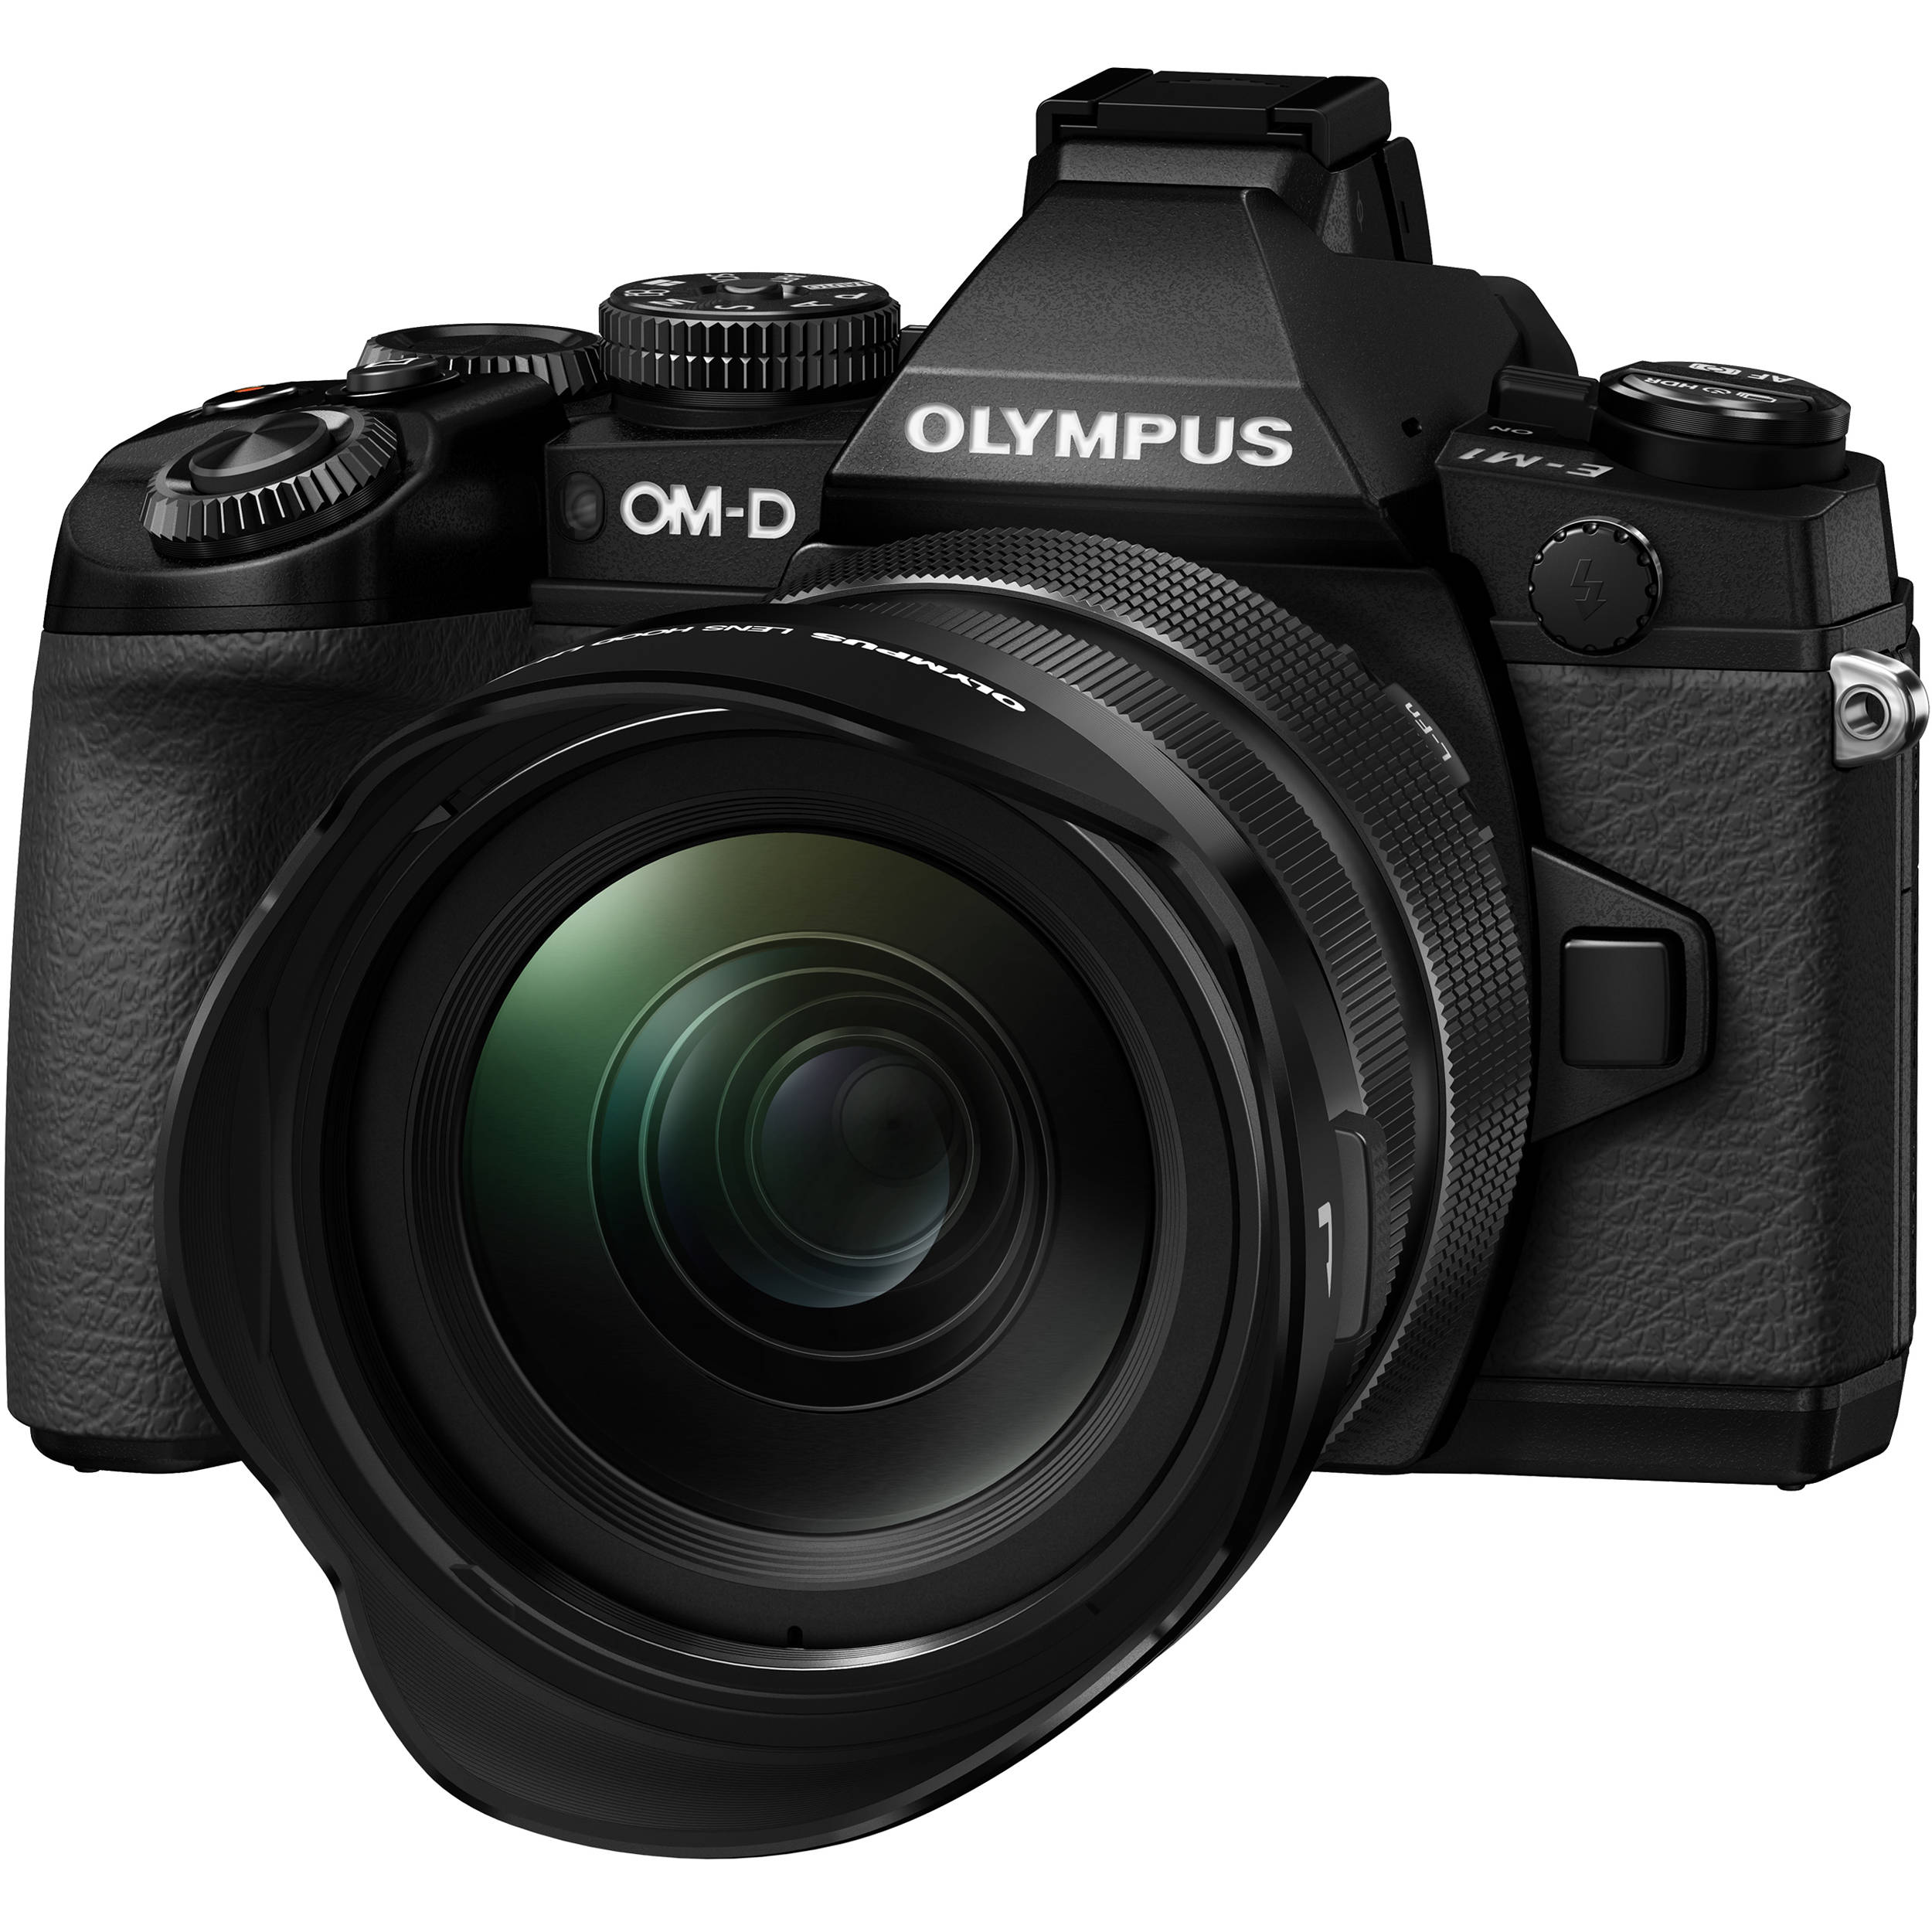 manual olympus e 420 espanol product user guide instruction u2022 rh testdpc co Olympus E 500 DSLR Camera Olympus E 500 DSLR Camera